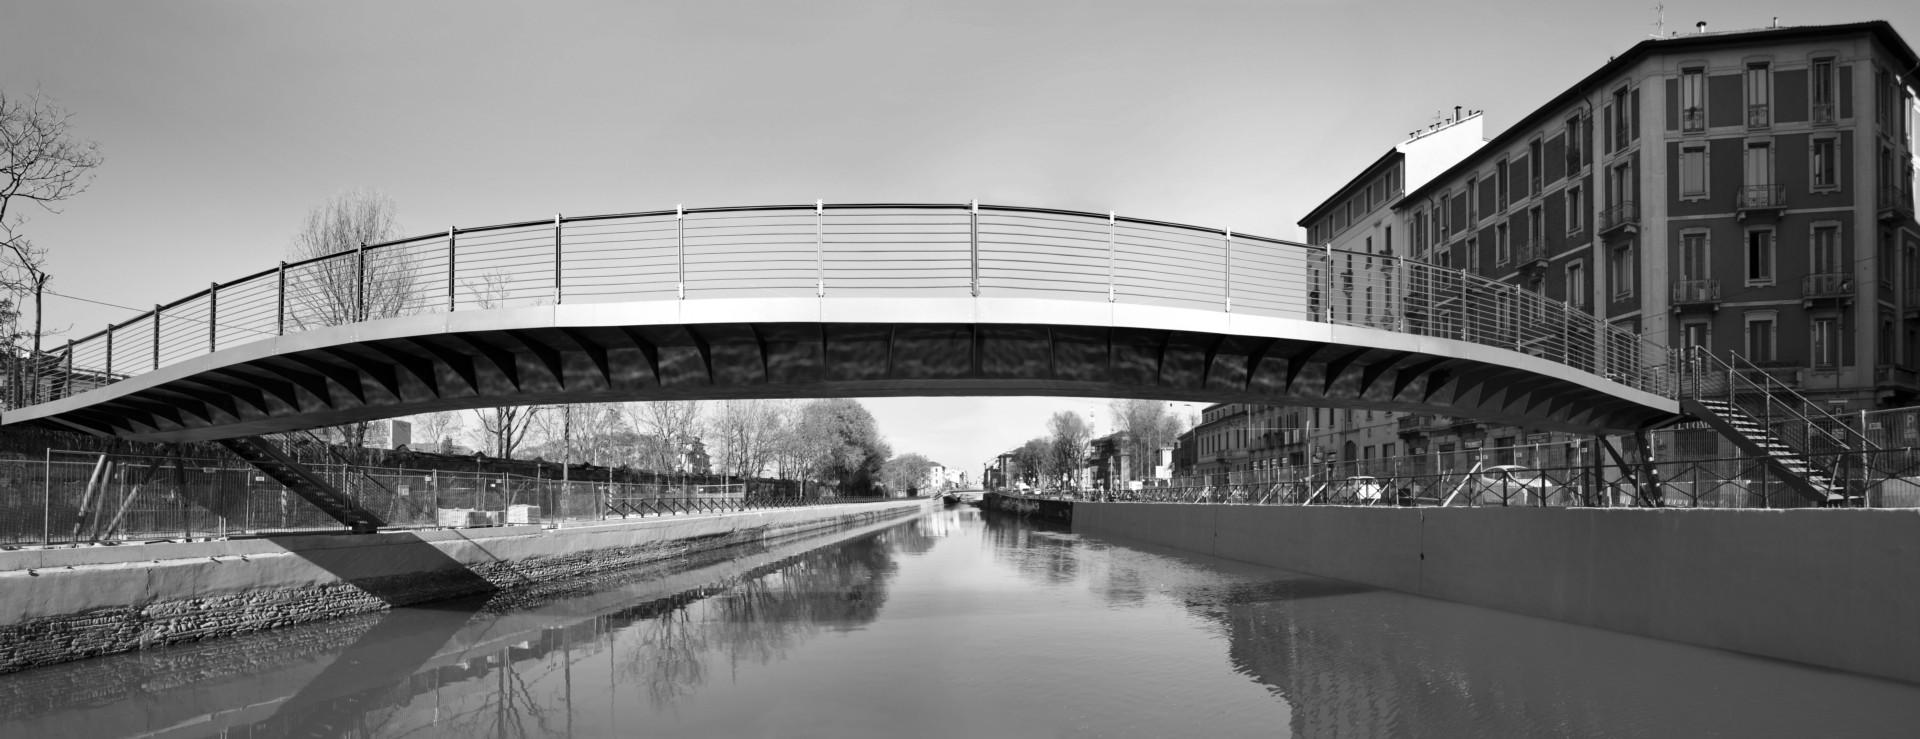 The BIM&DIGITAL Award 2017 goes to the bridges over the Naviglio Grande in Milan